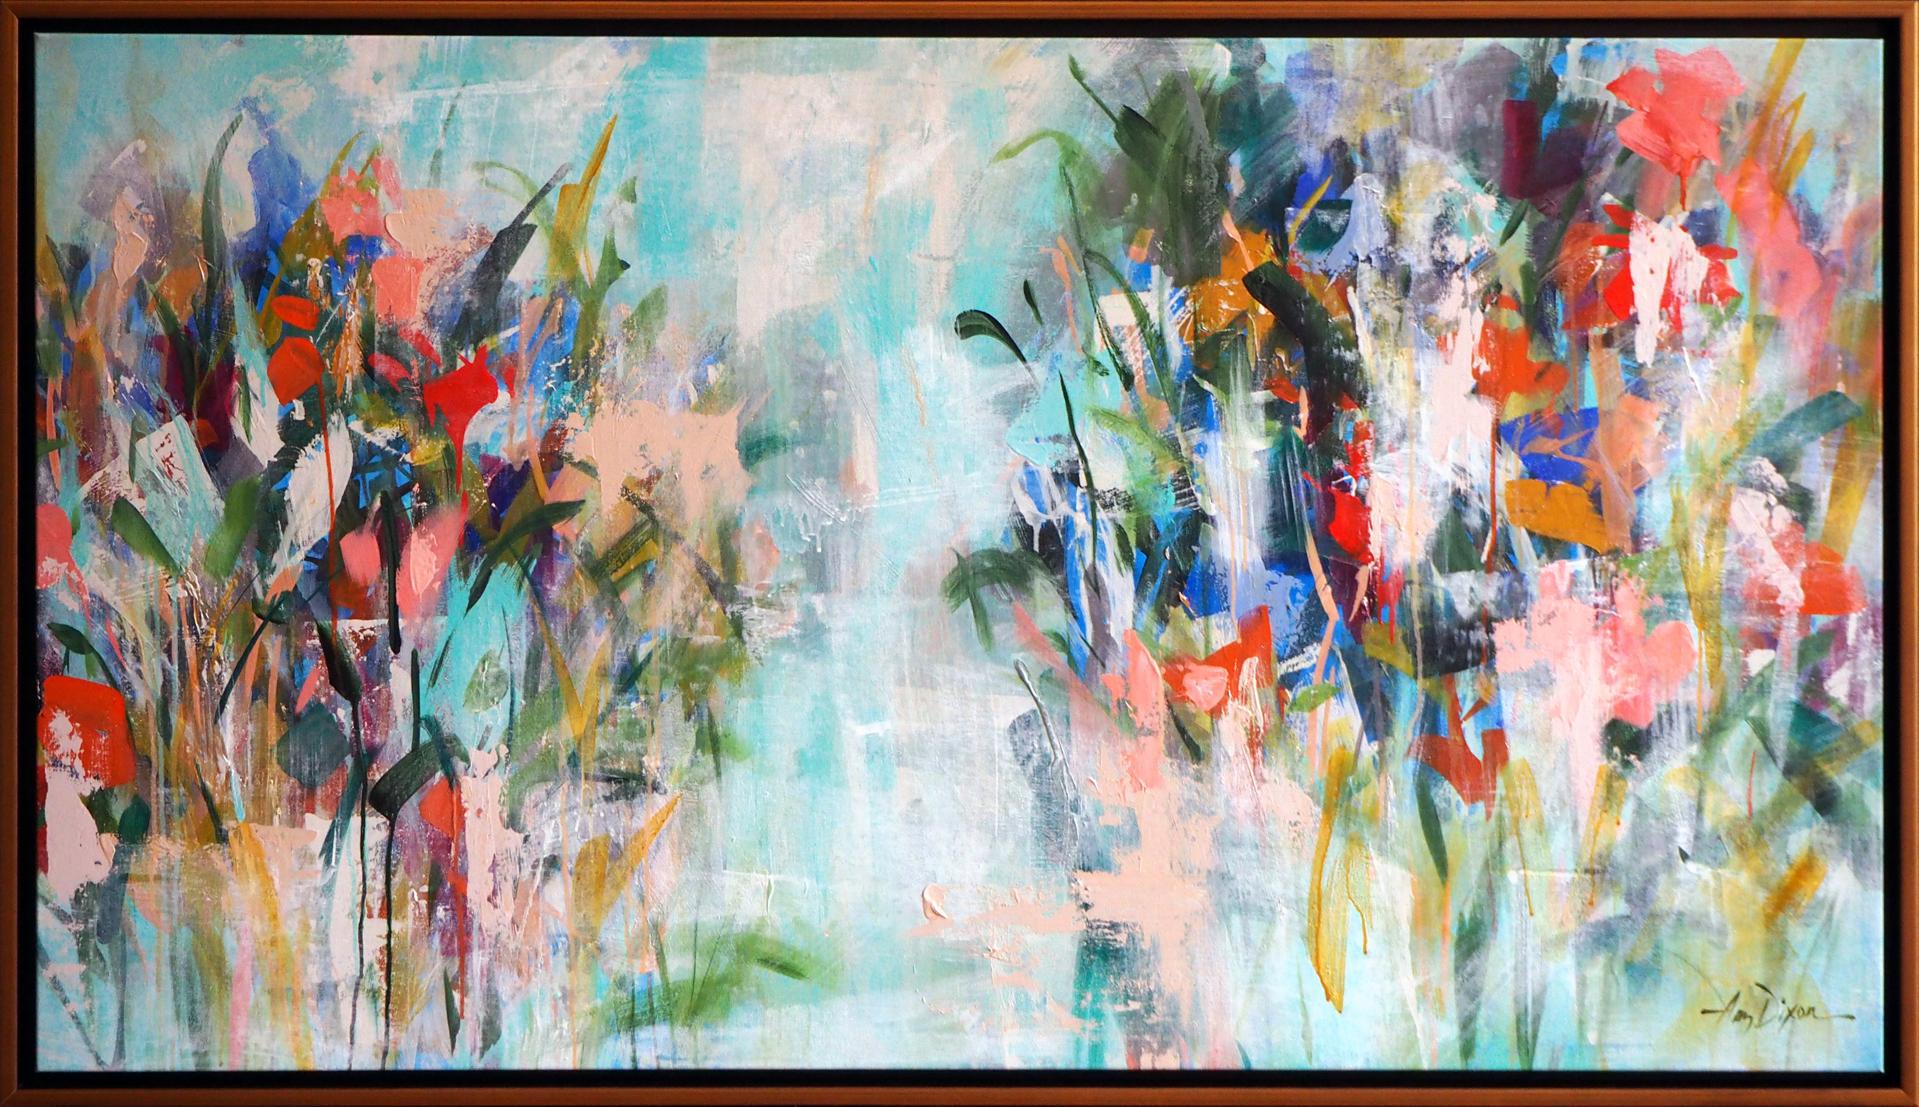 Free Spirit by Amy Dixon